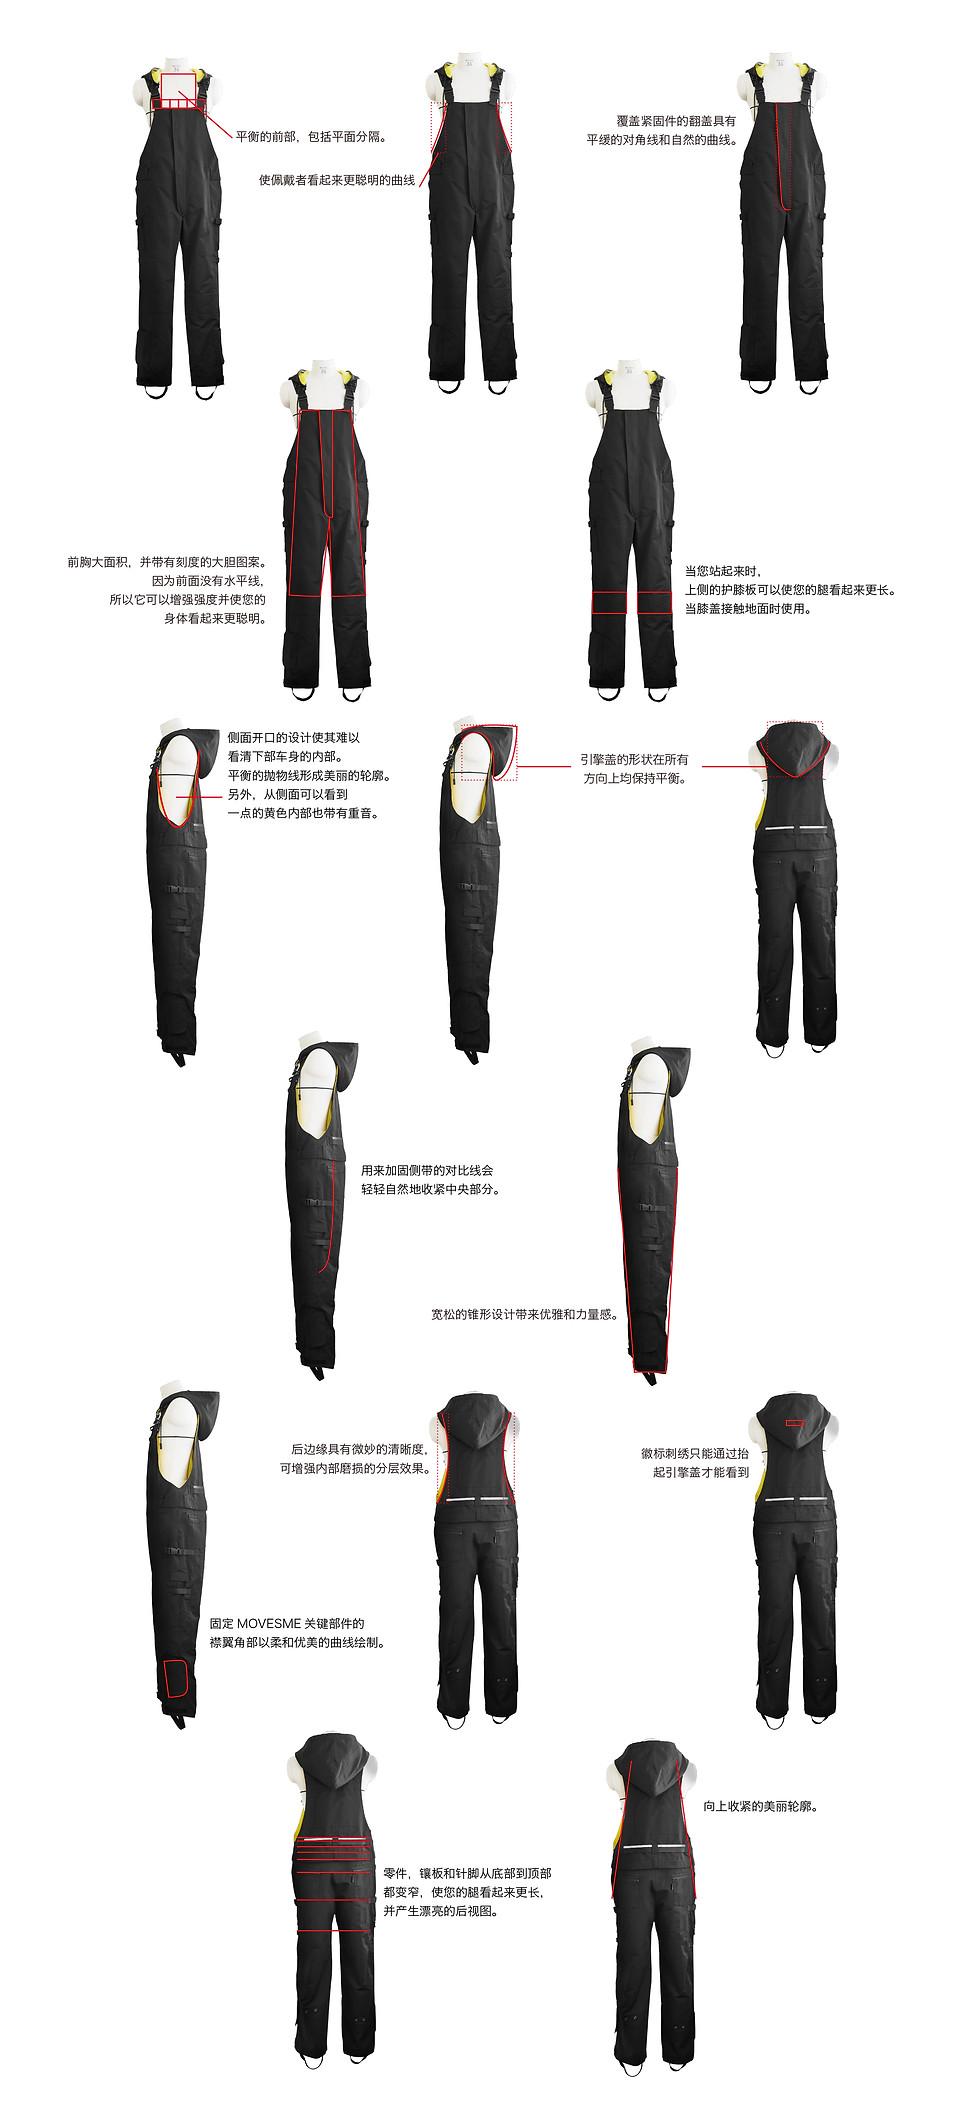 design_0501_cn.jpg